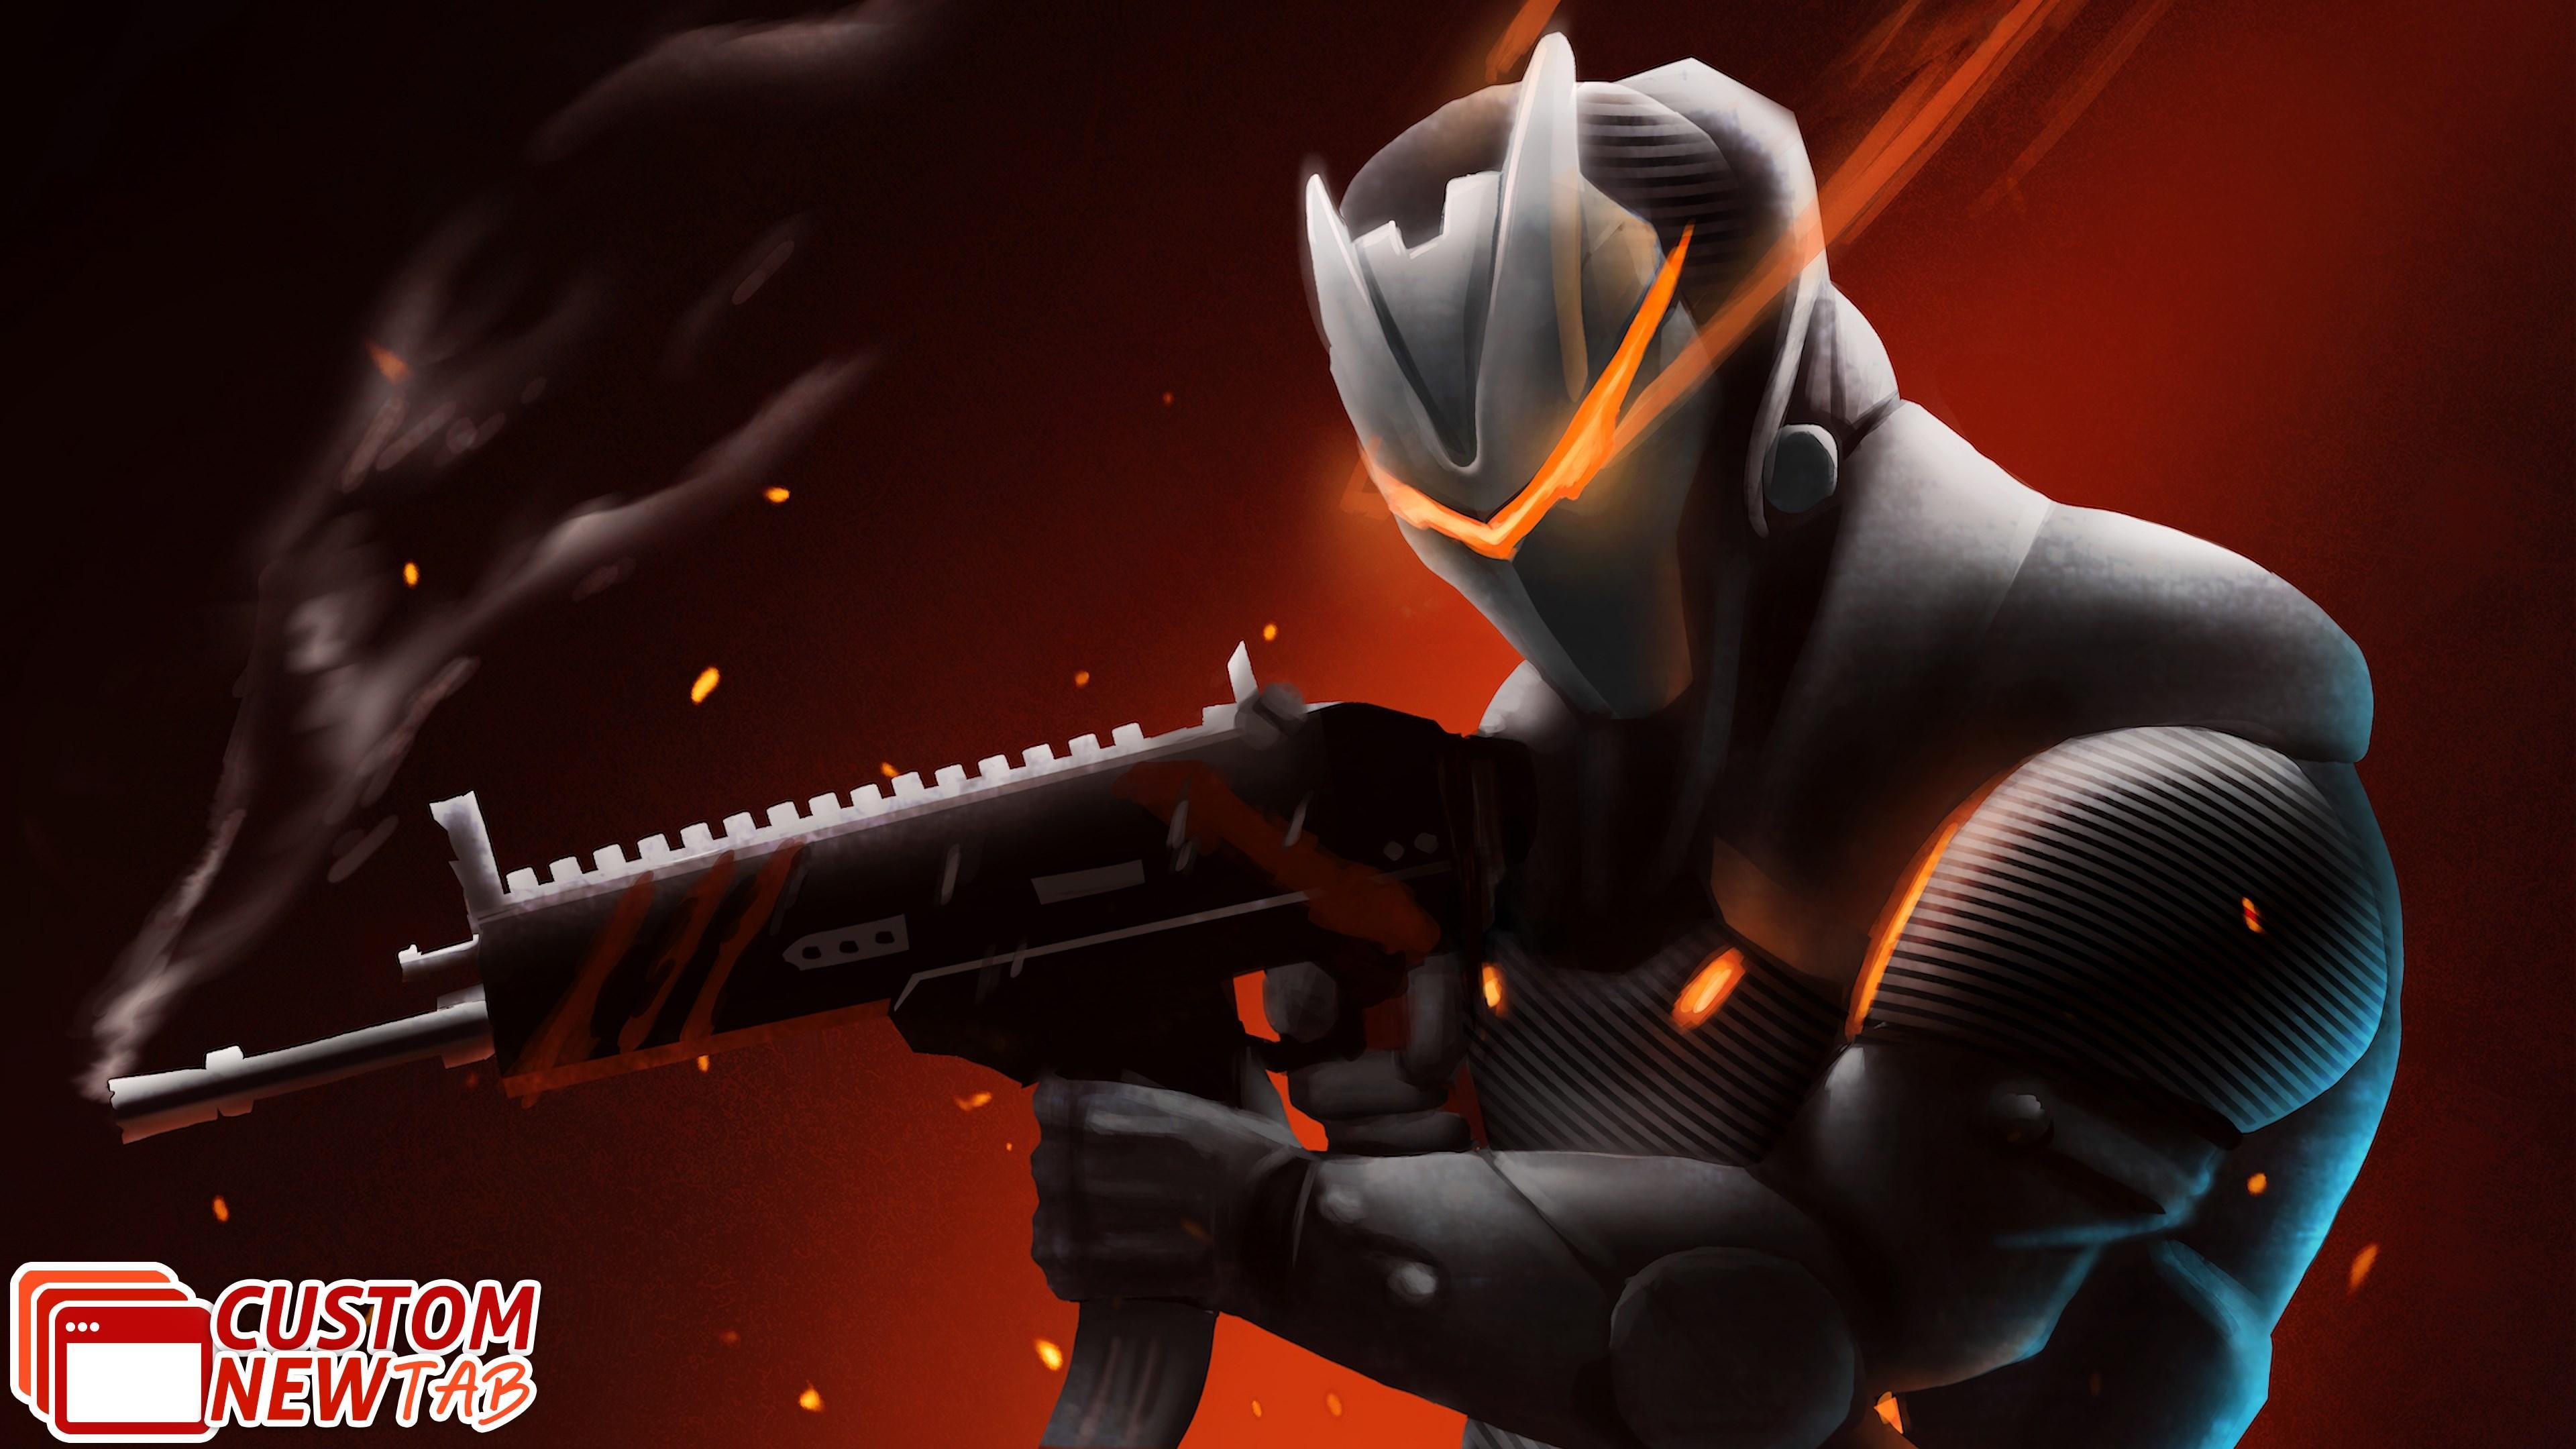 Cool Ninja Fortnite Hd Wallpapers Top Free Cool Ninja Fortnite Hd Backgrounds Wallpaperaccess